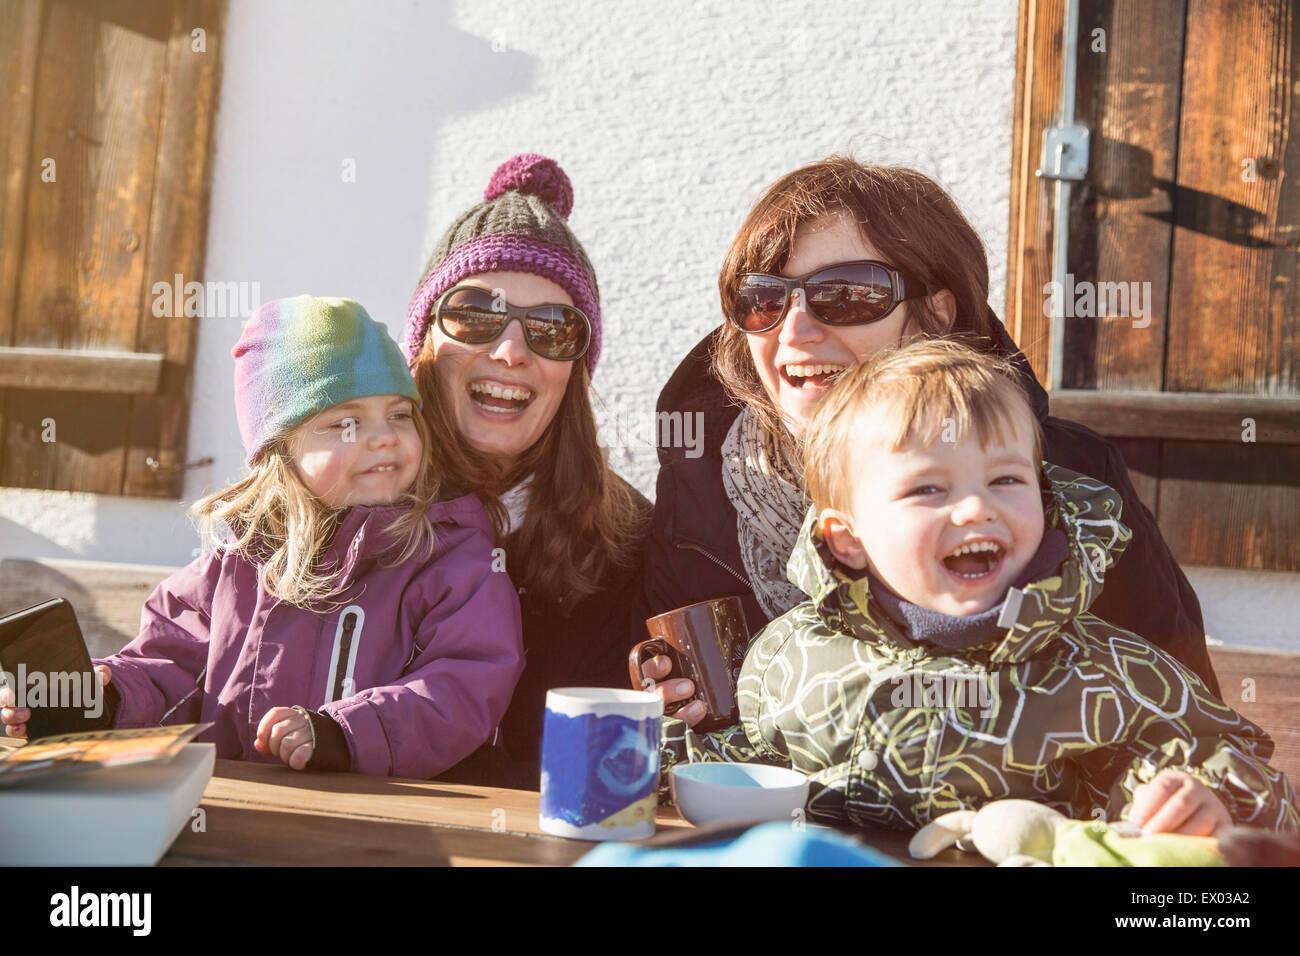 Family on vacation, Achenkirch, Tirol, Austria - Stock Image